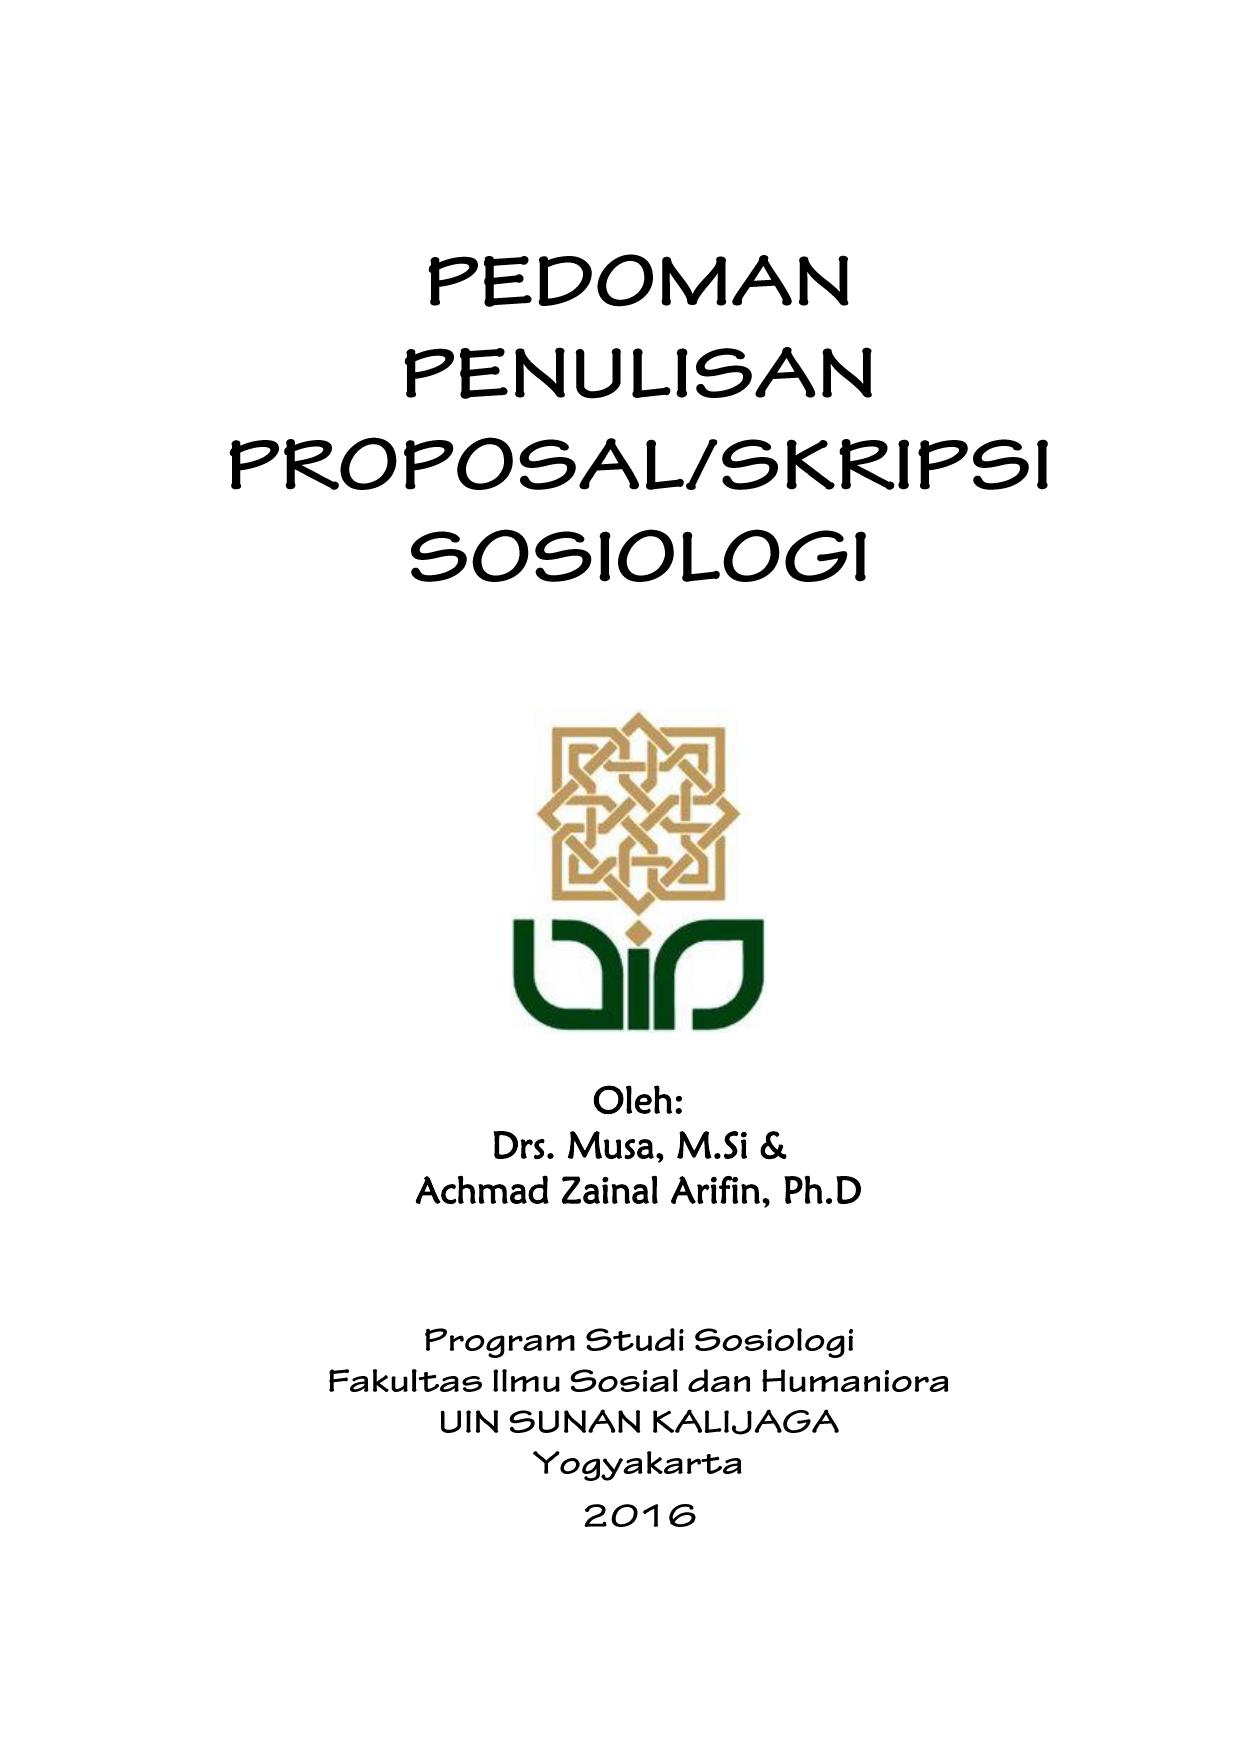 Menulis Paper Sosiologi Sosiologi Uin Sunan Kalijaga